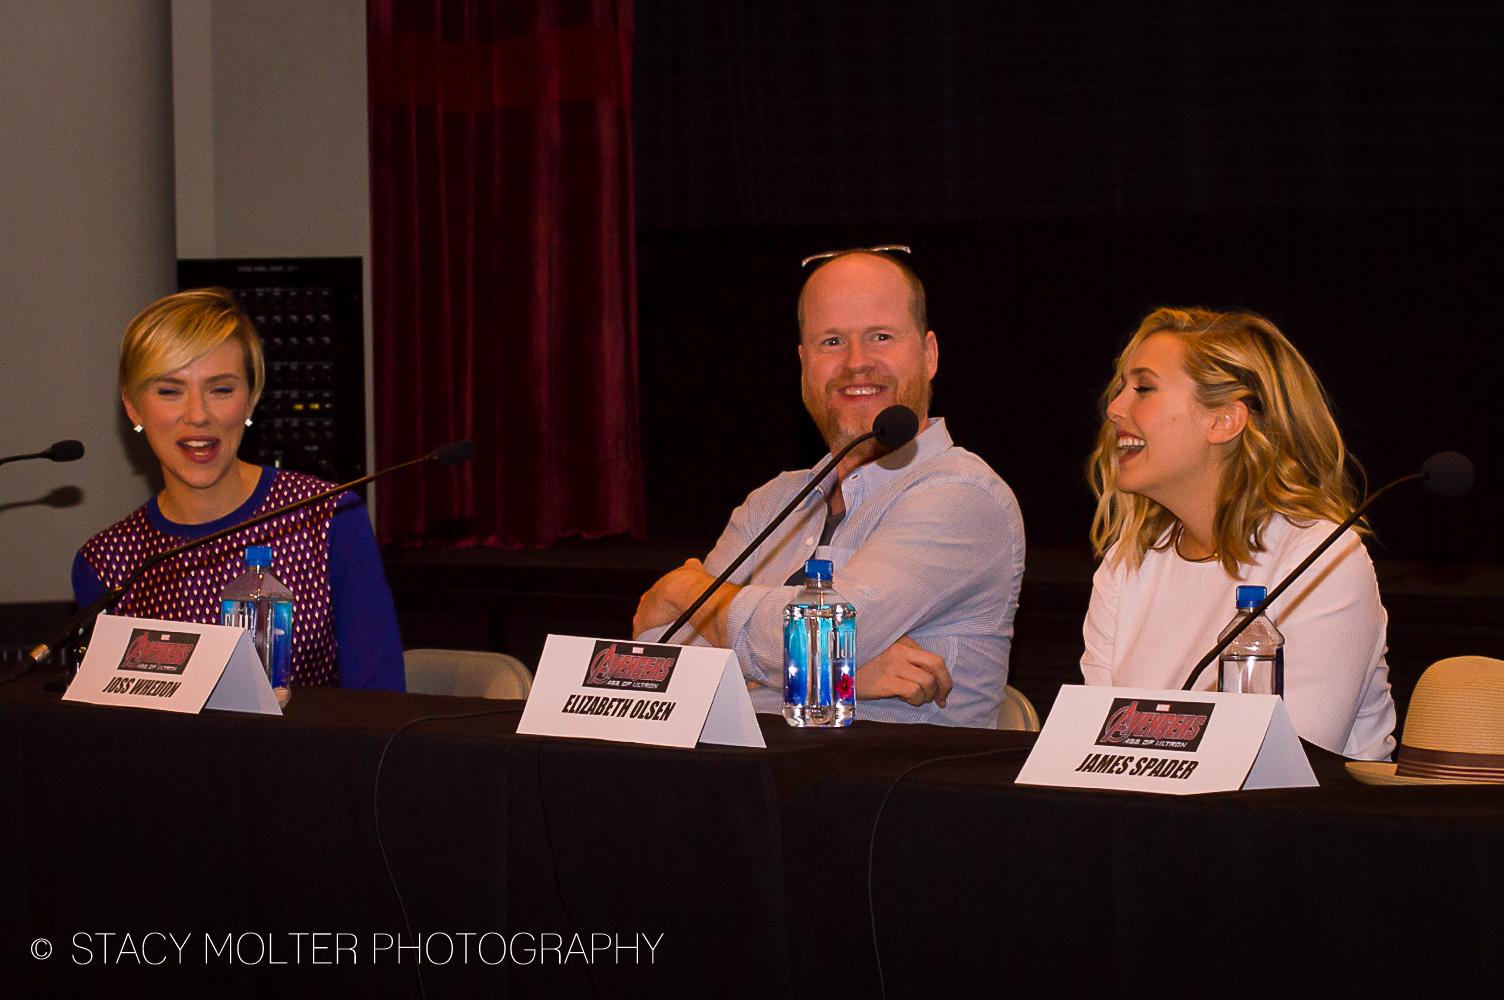 Scarlett Johansson, Joss Whedon, Elizabeth Olsen - Avengers Age of Ultron Press Conference Junket